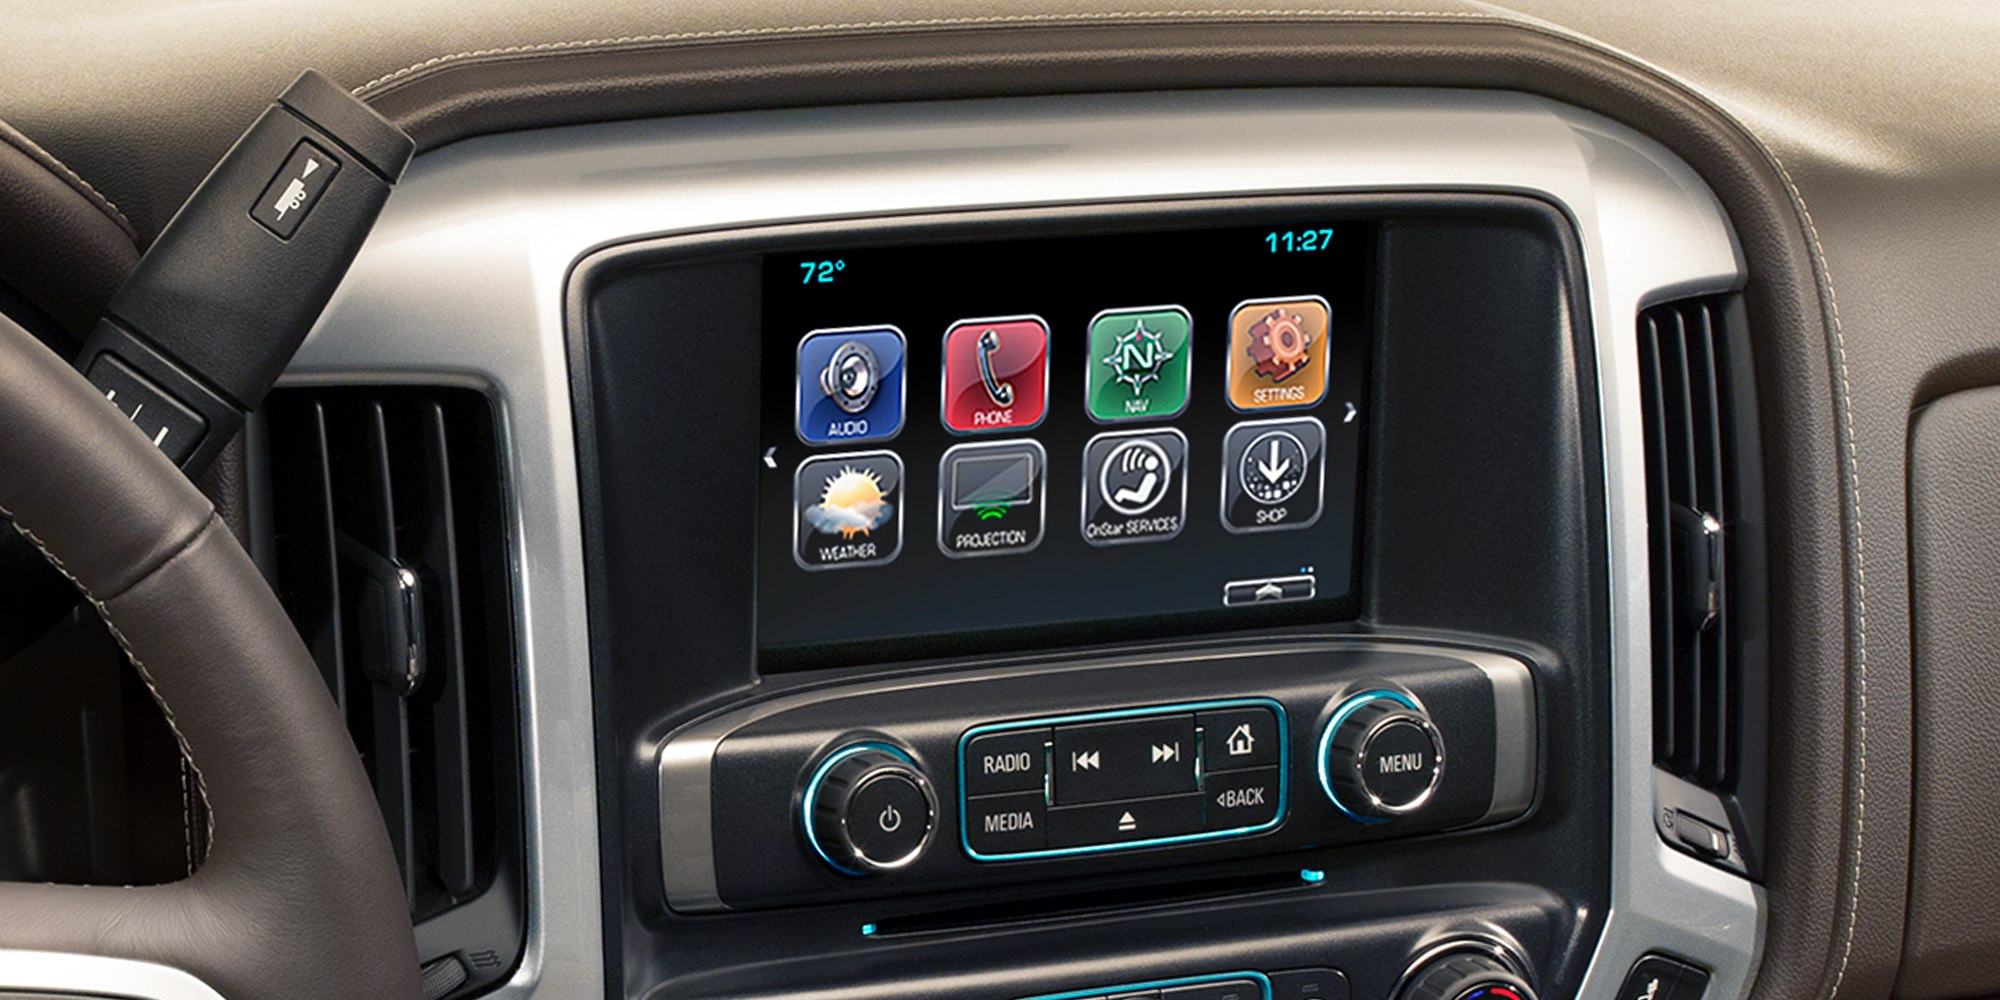 2018 Chevrolet Silverado 1500 Infotainment Center